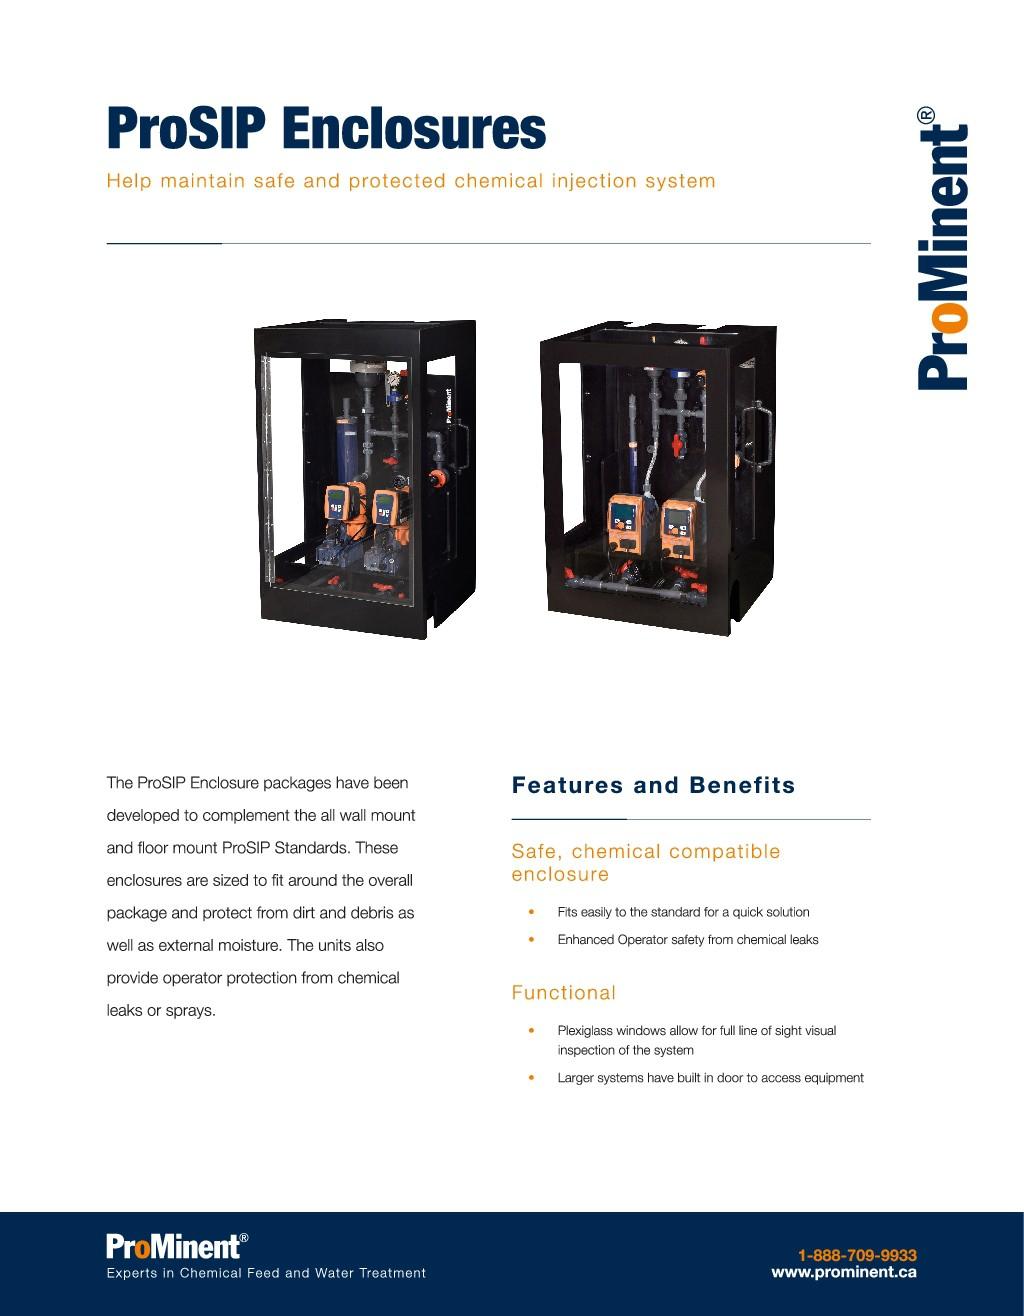 ProSIP Enclosure Brochure Design